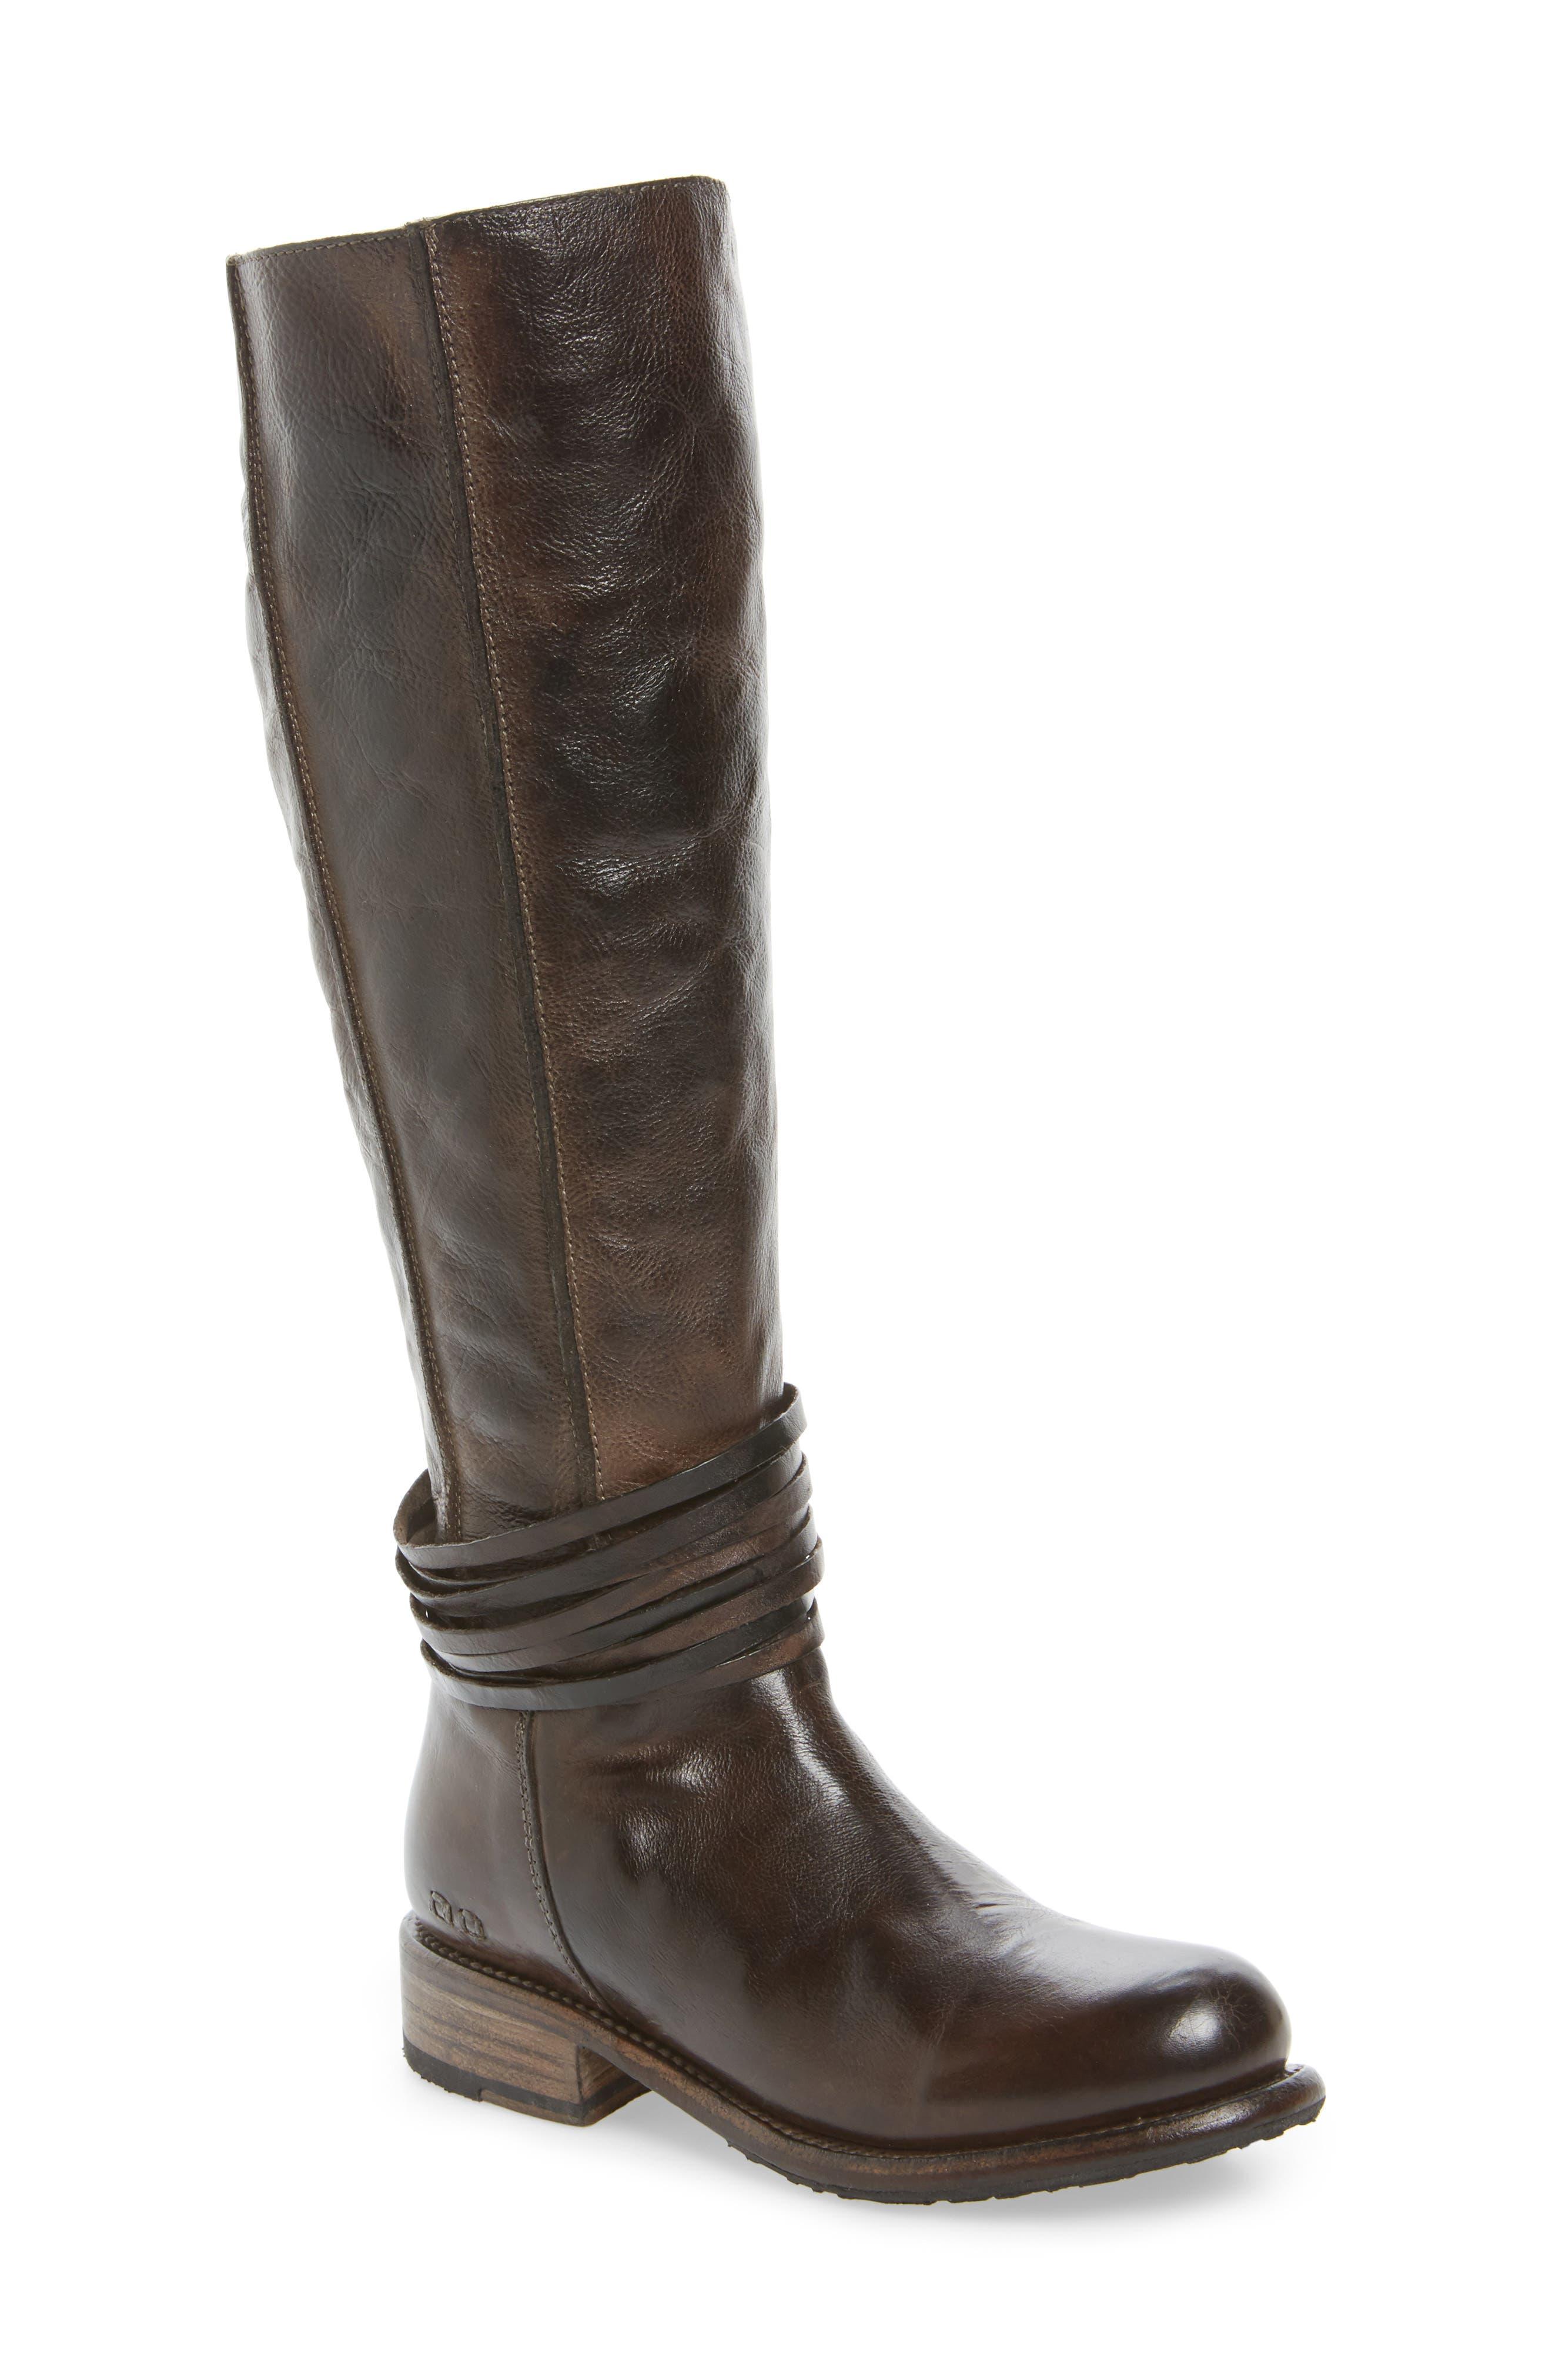 Main Image - Bed Stu Weymouth Knee High Boot (Women)